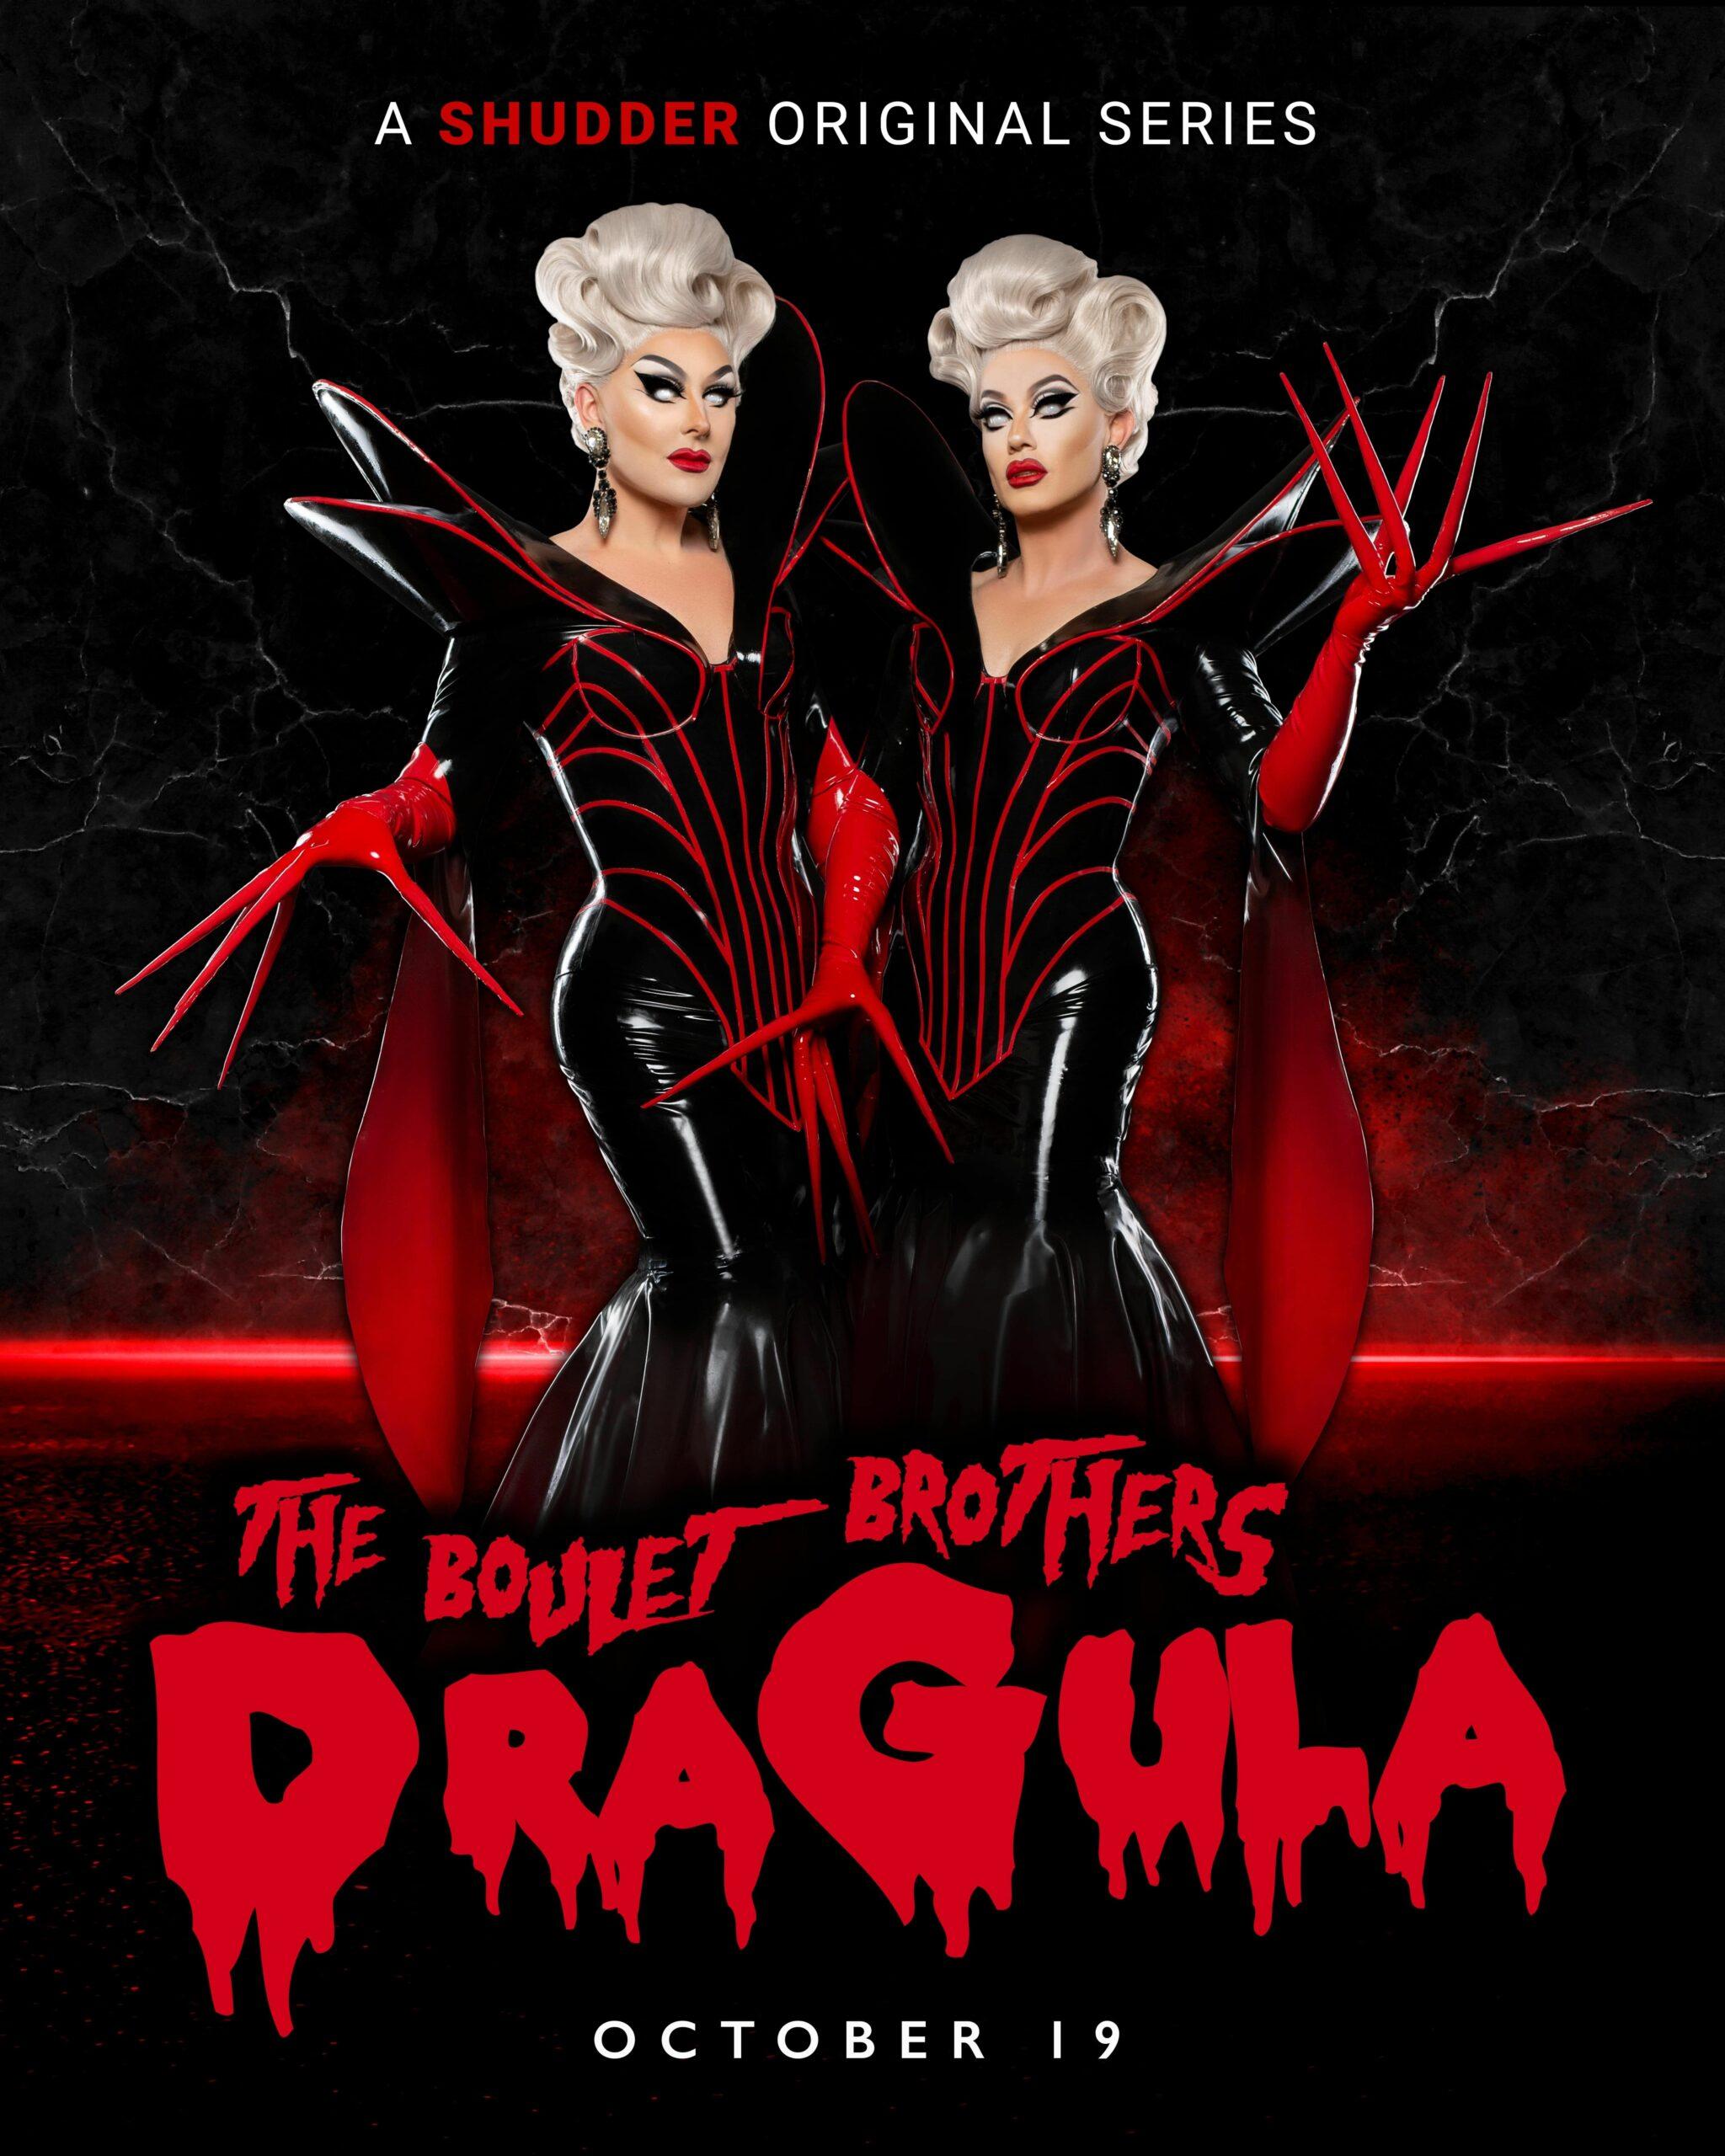 The Boulet Brothers' Dragula teaser image